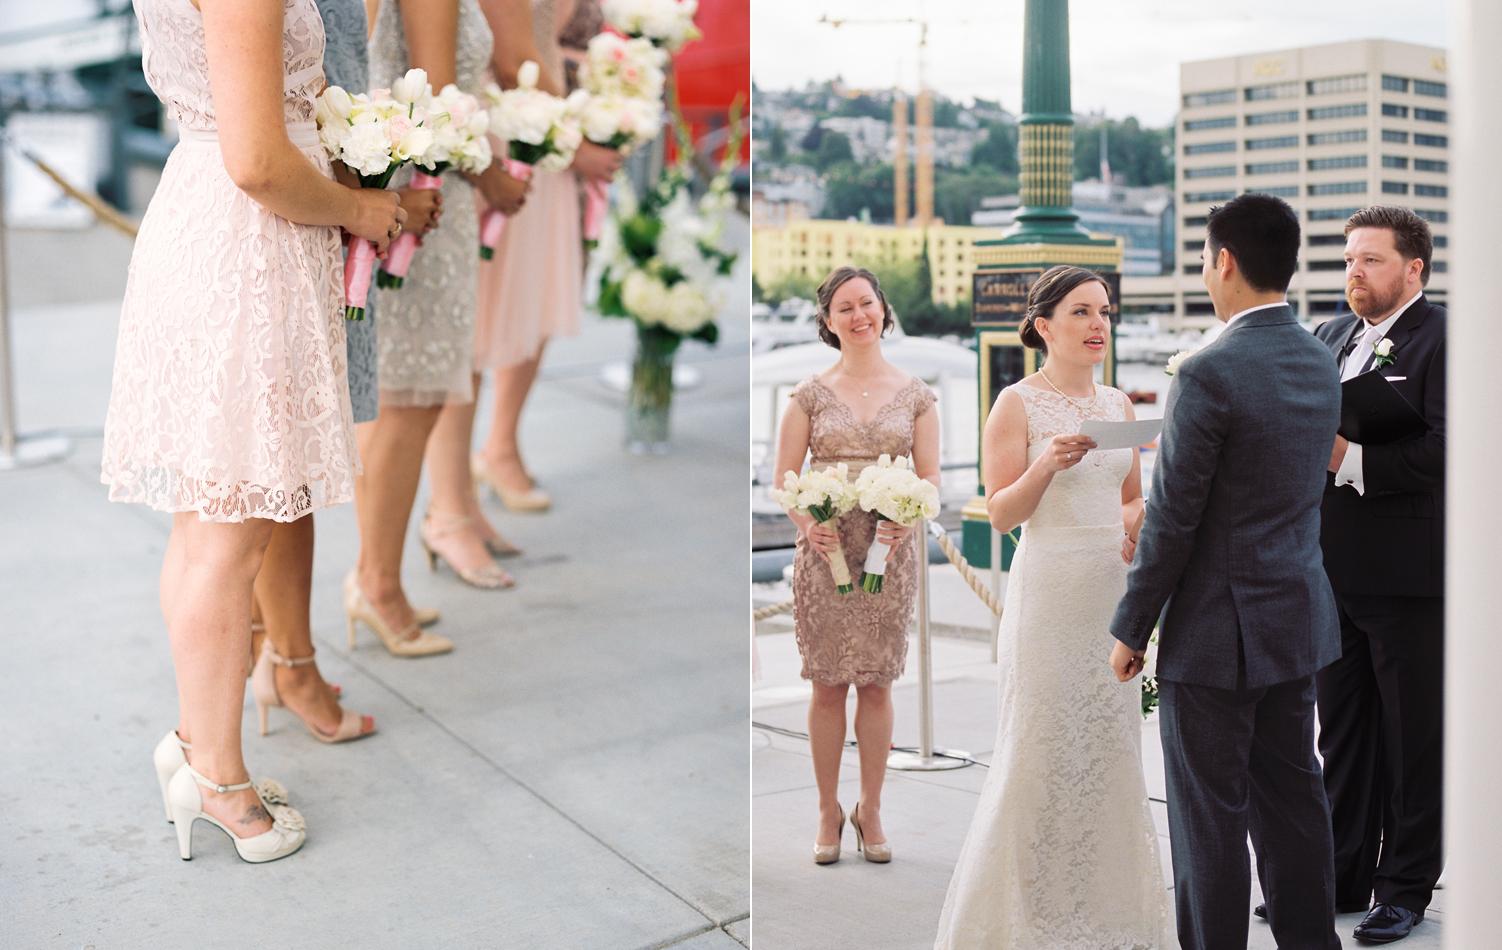 seattle wedding ceremony details mohai wedding photography.jpg